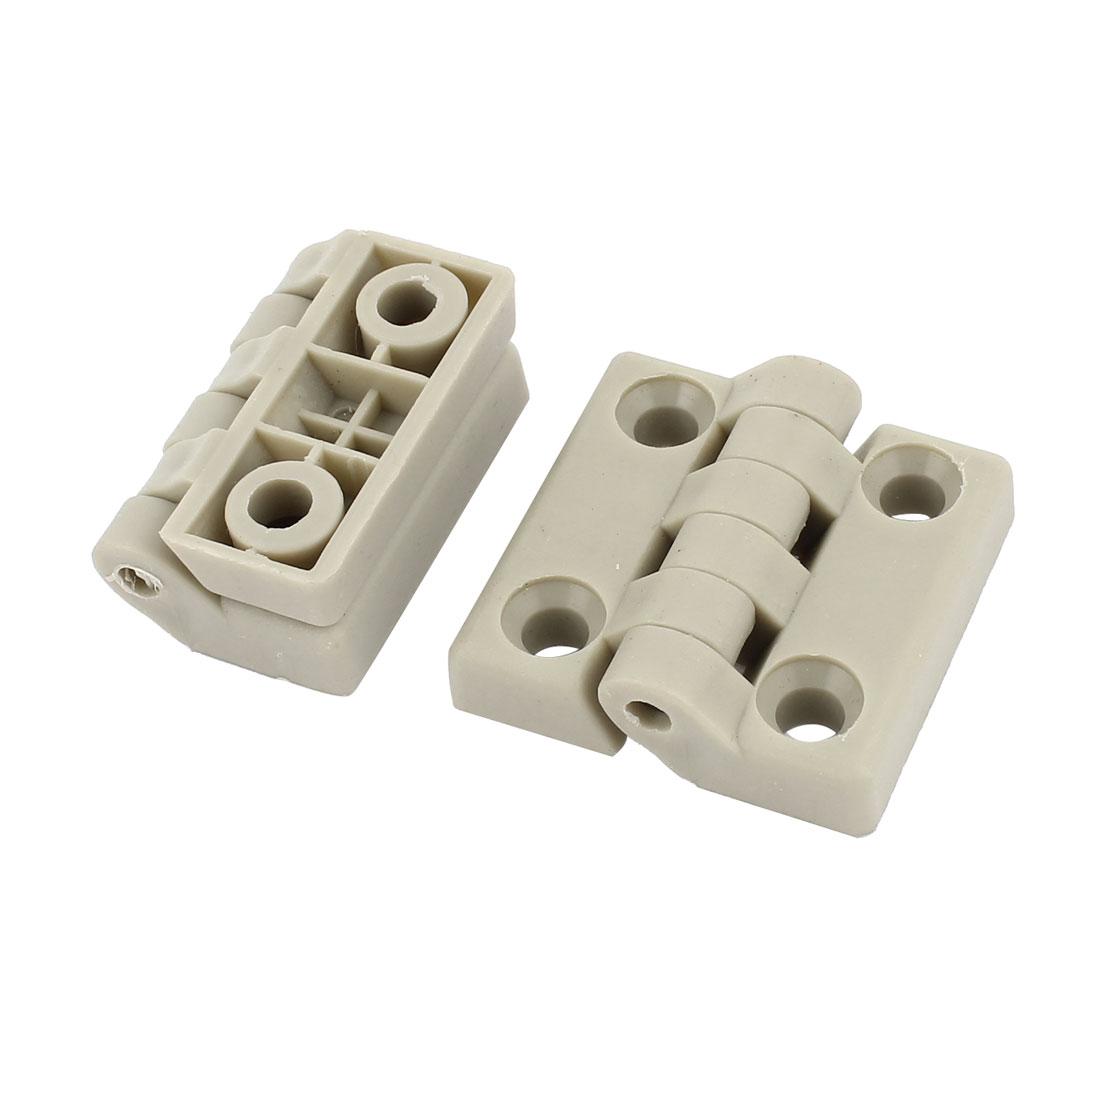 2pcs 48 x 30 x 19mm Folding 7m Hole Dia Industrial Plastic Hinge Gray